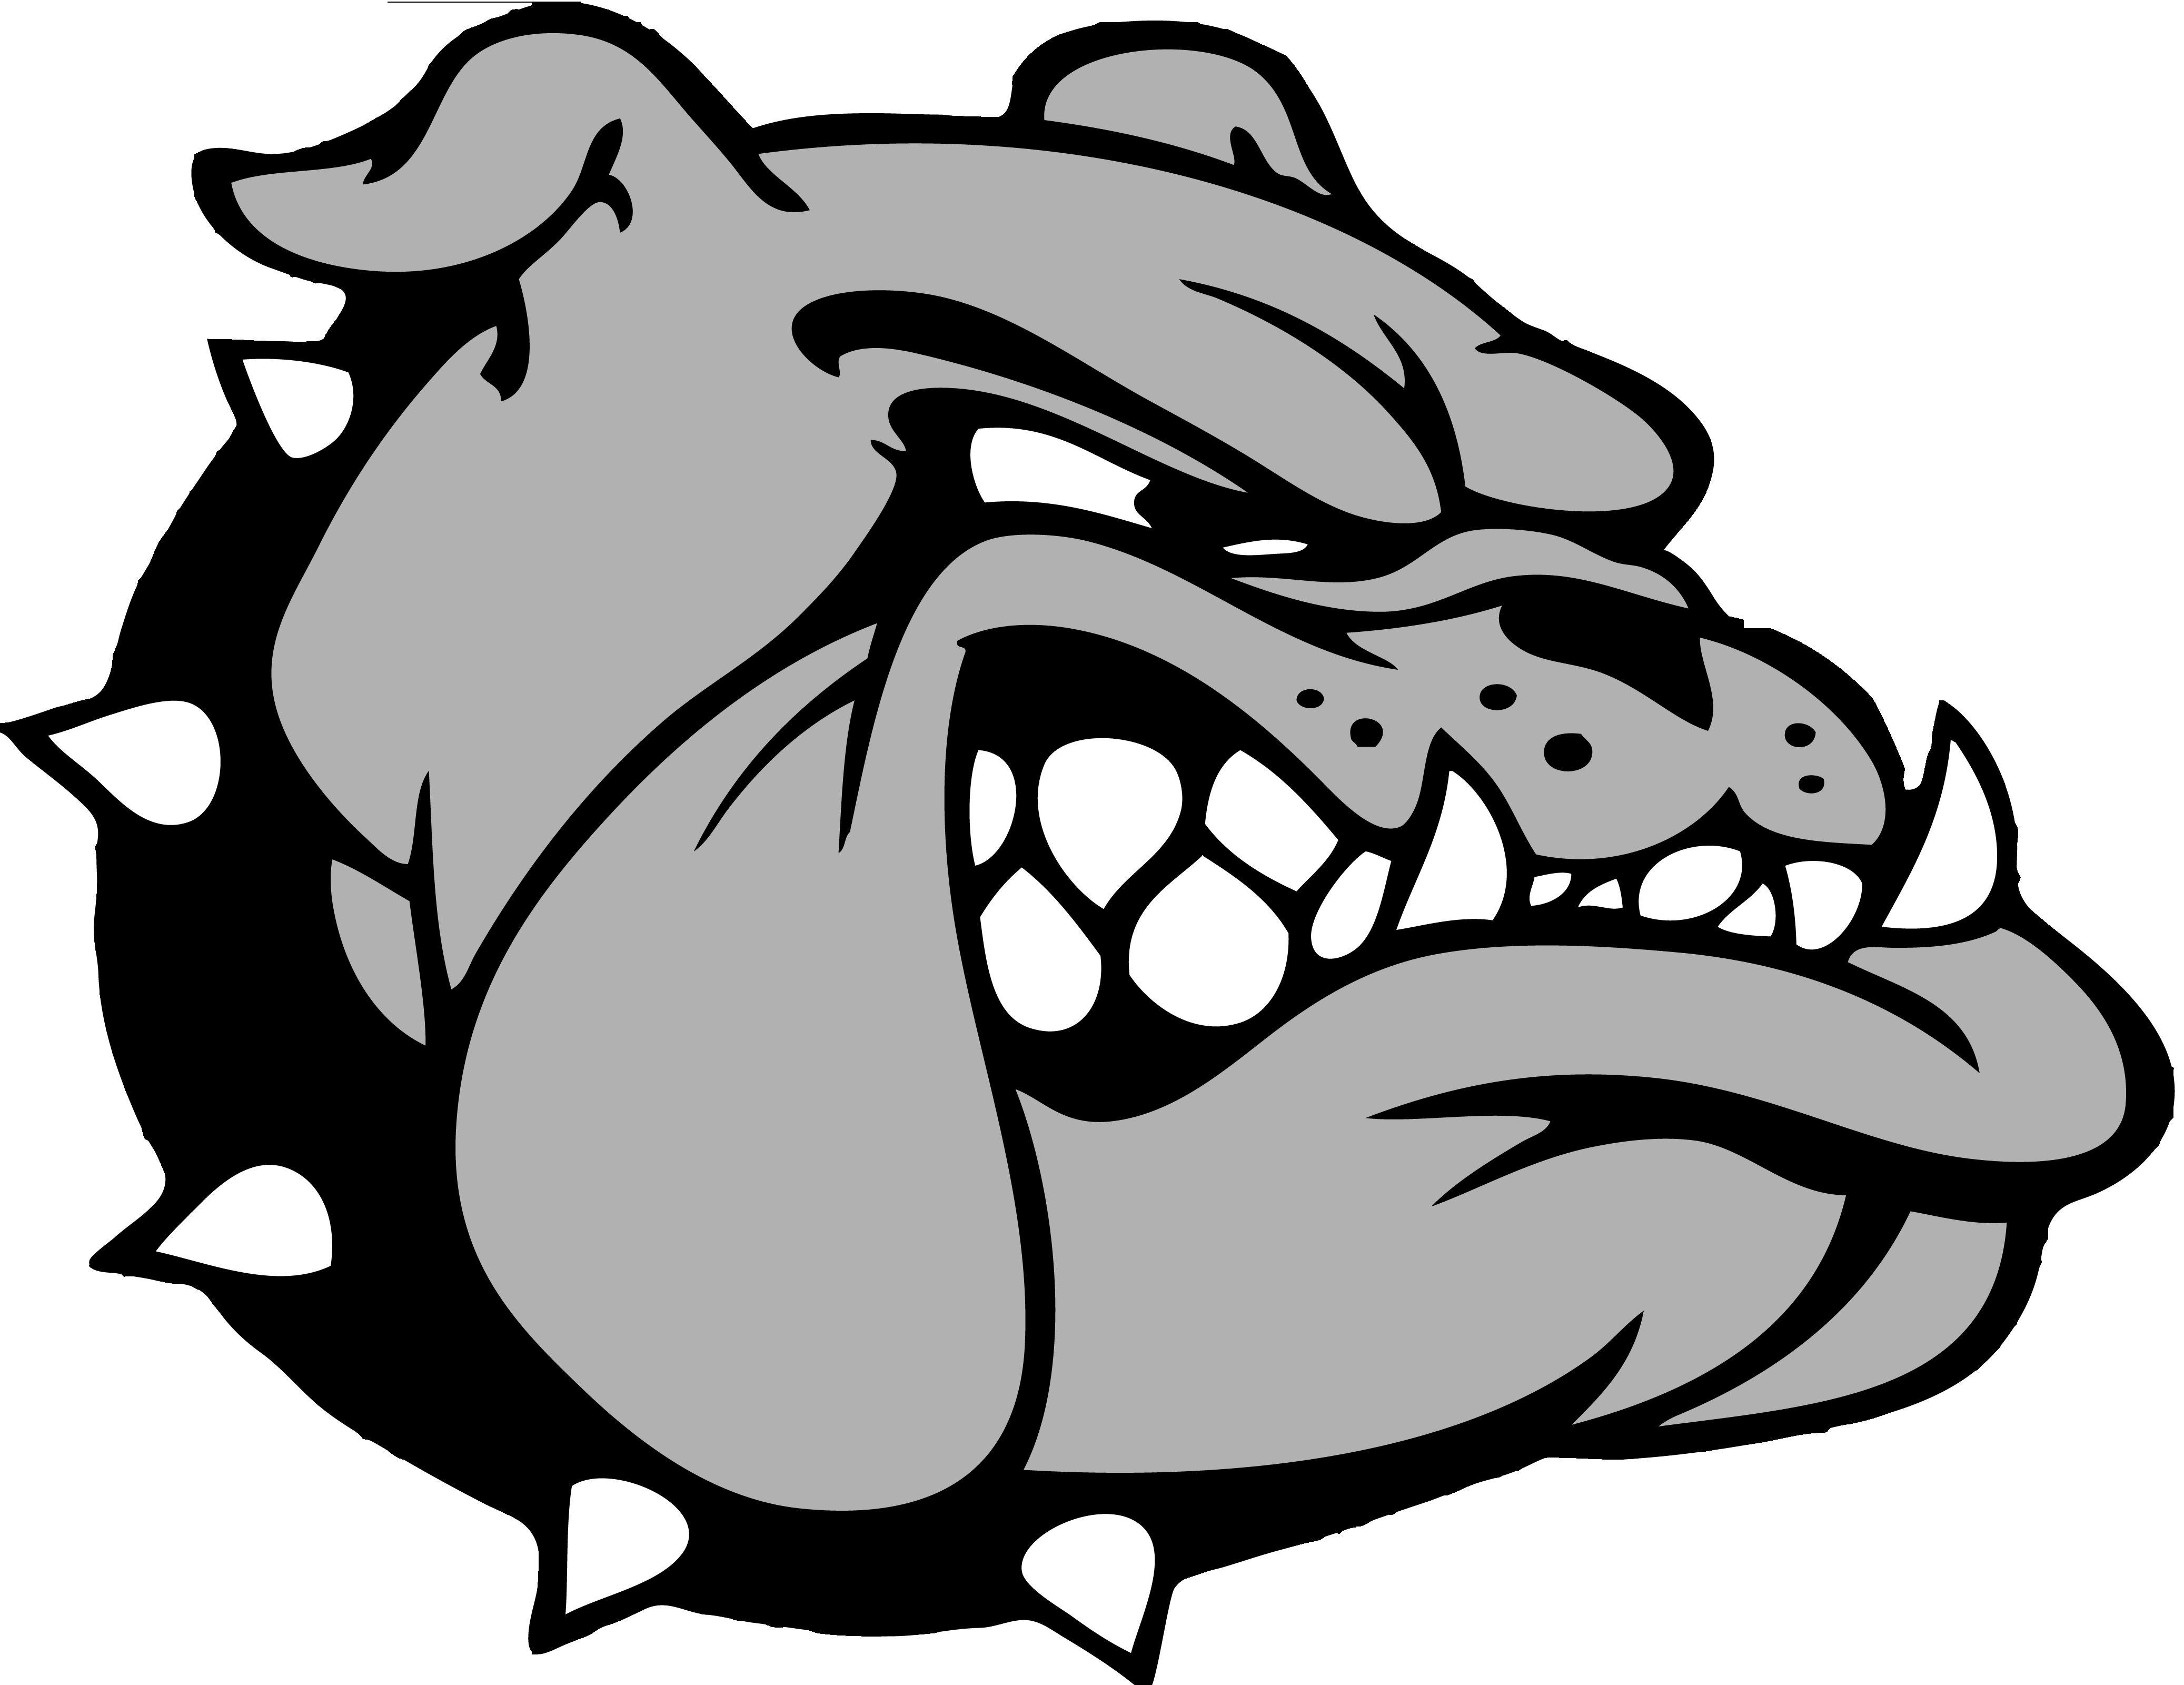 School Mascot Bulldog Clip Art | ... 148px x 3,200px http ...